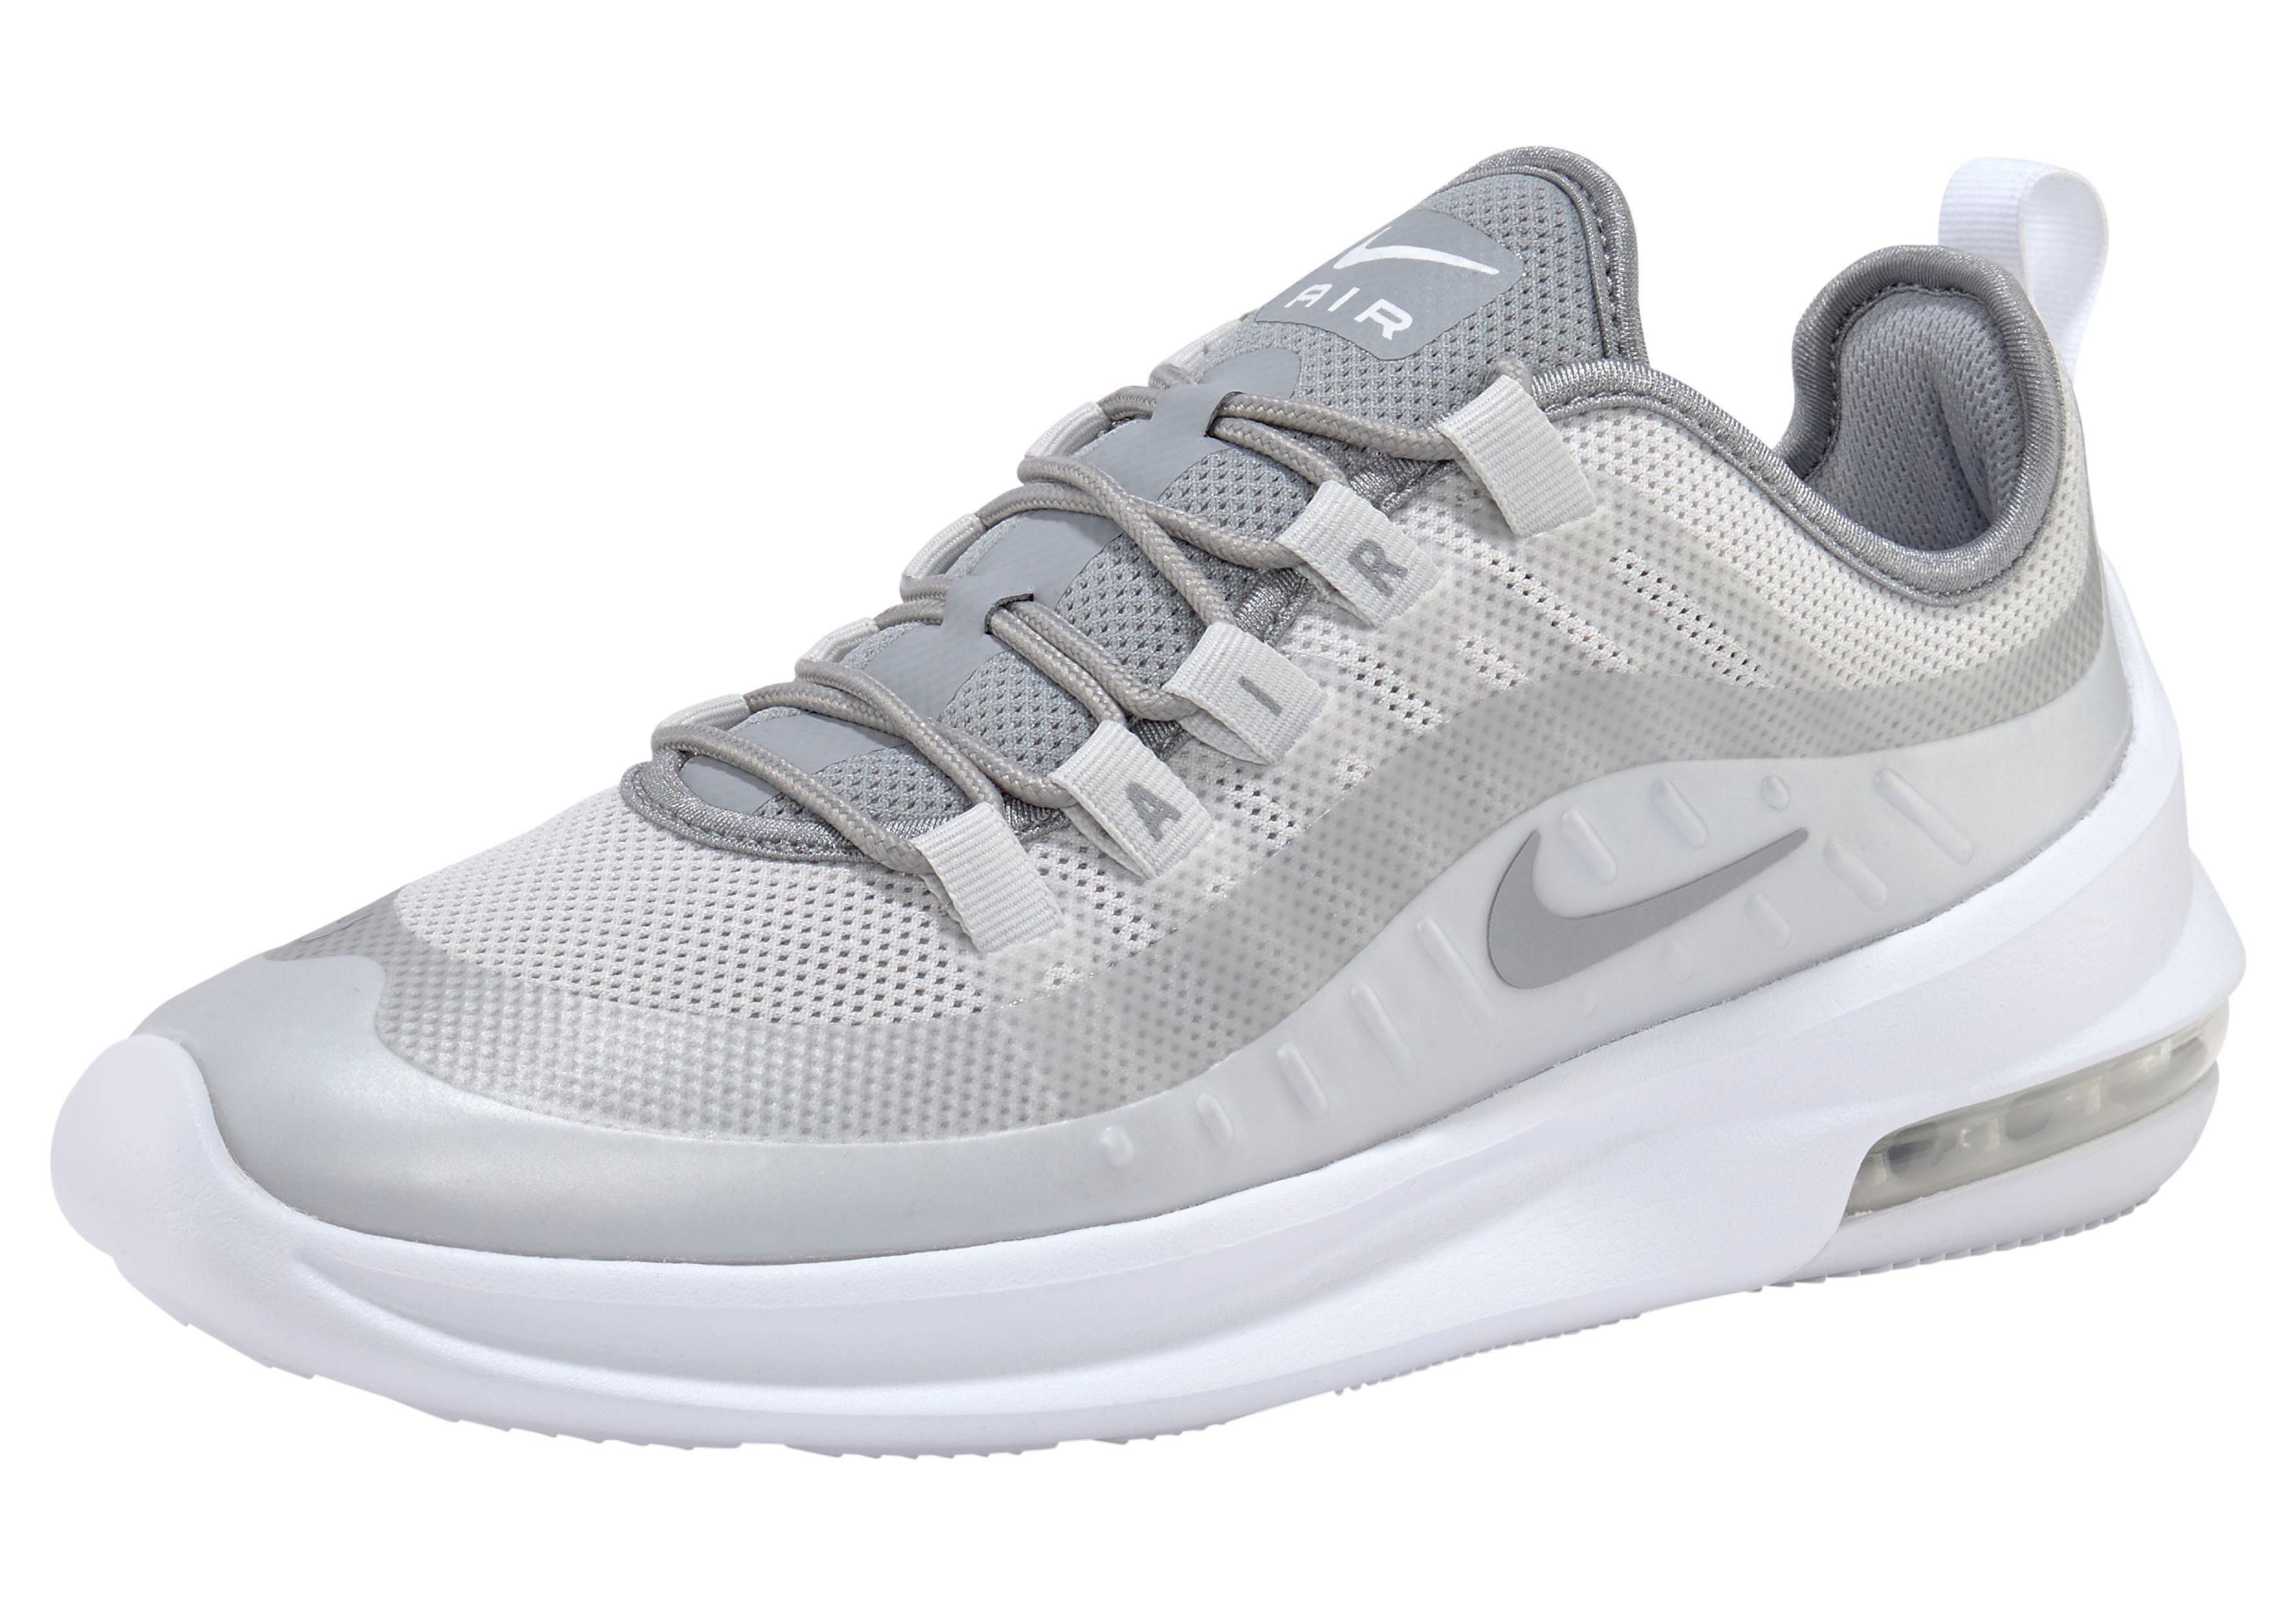 Nike Damen Air Max Axis Sneaker